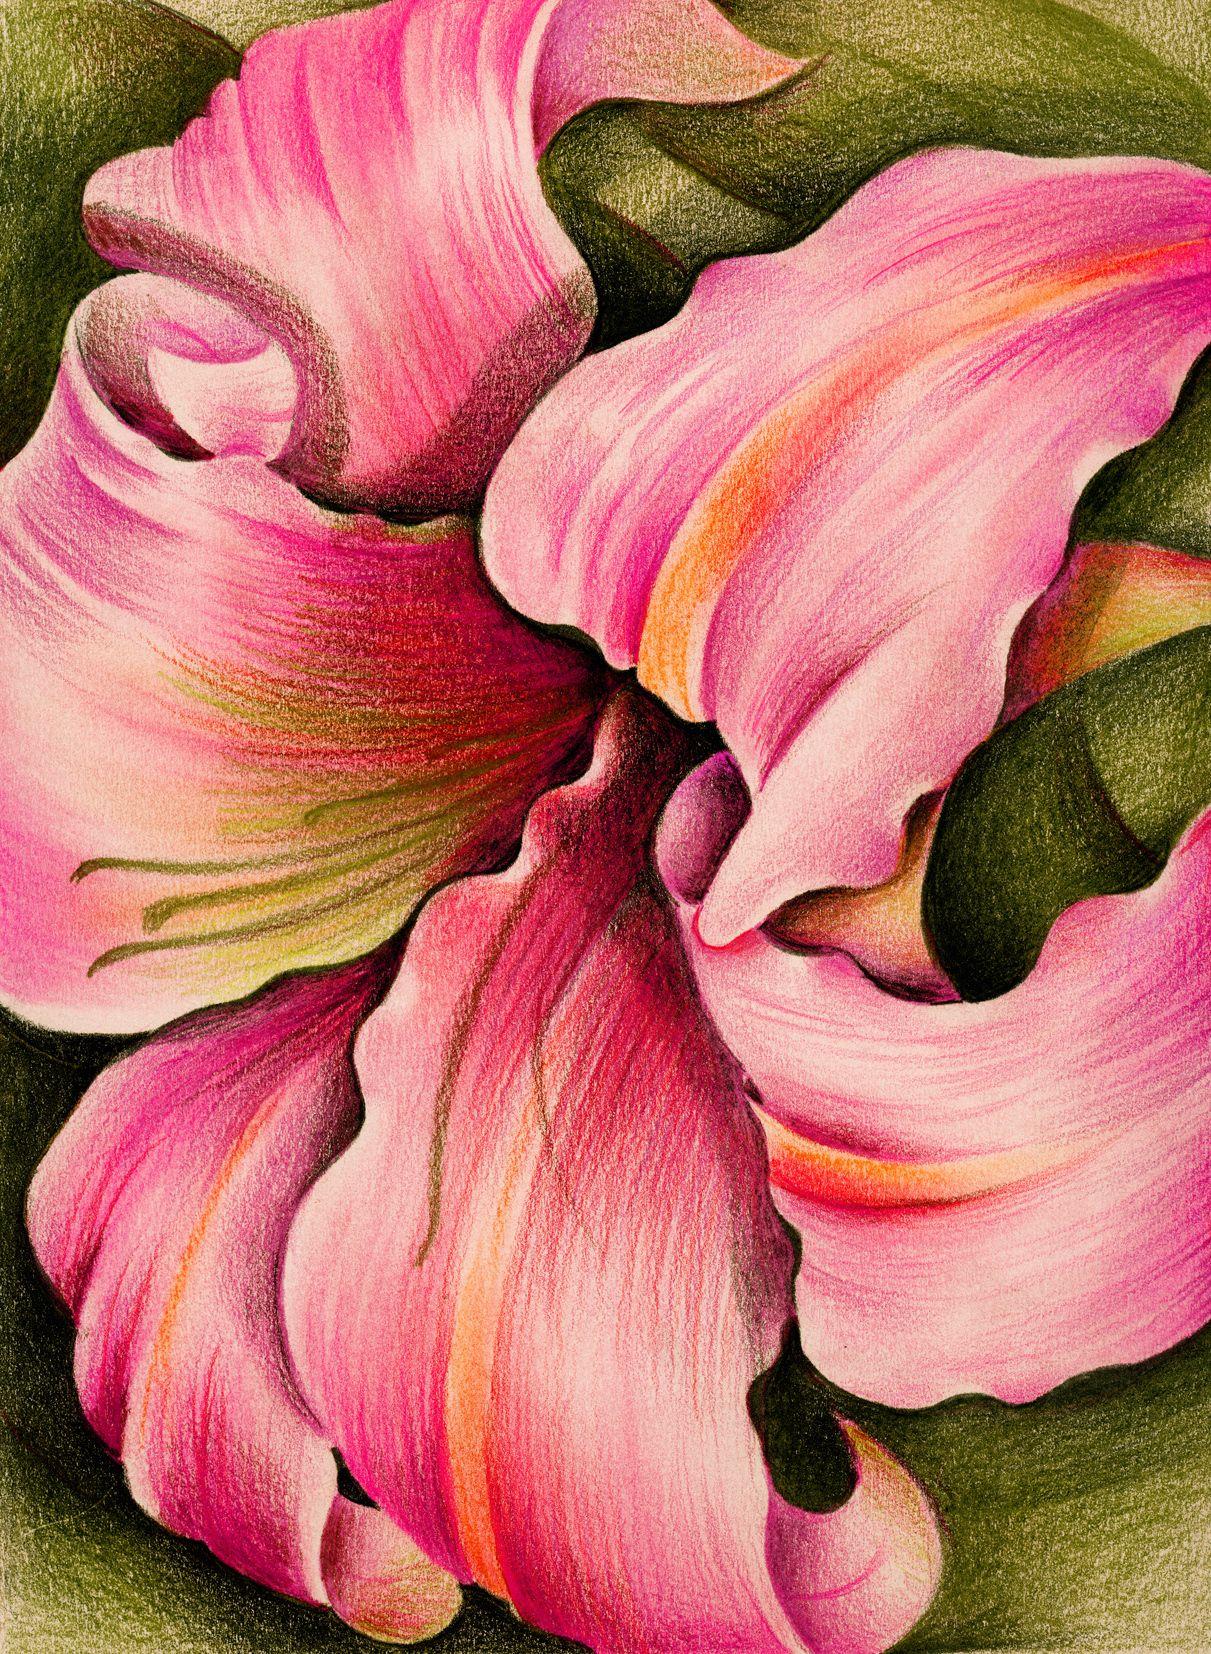 de -lirios   Resim   Pinterest   Colored pencils, Flowers and Paintings